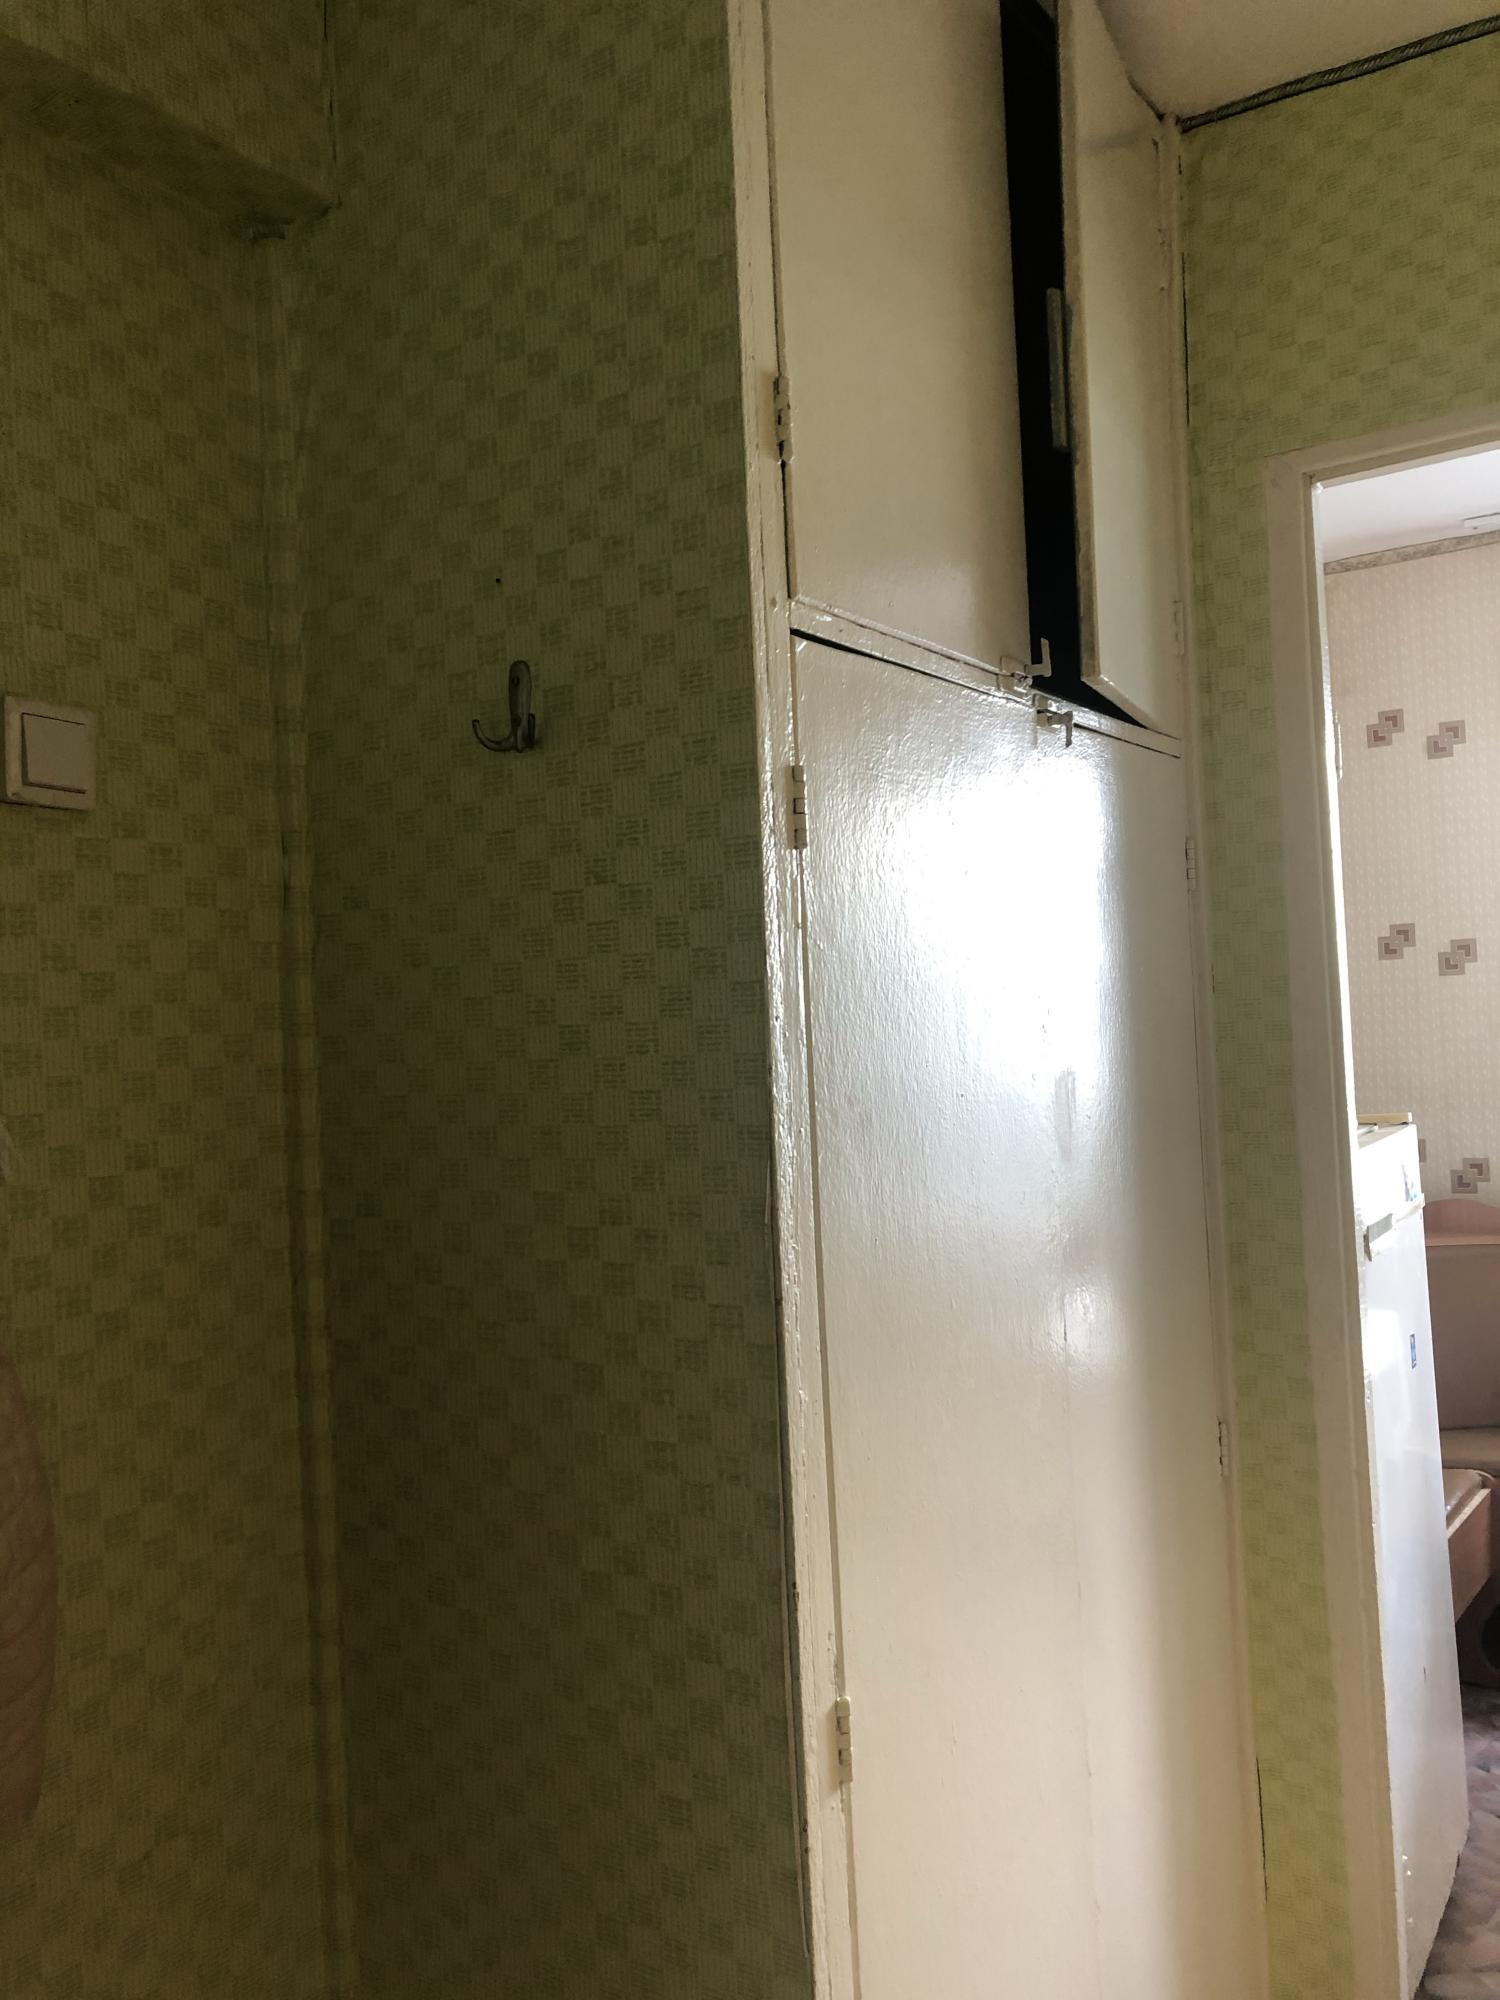 1к квартира Судостроительная улица, 30 | 10000 | аренда в Красноярске фото 7